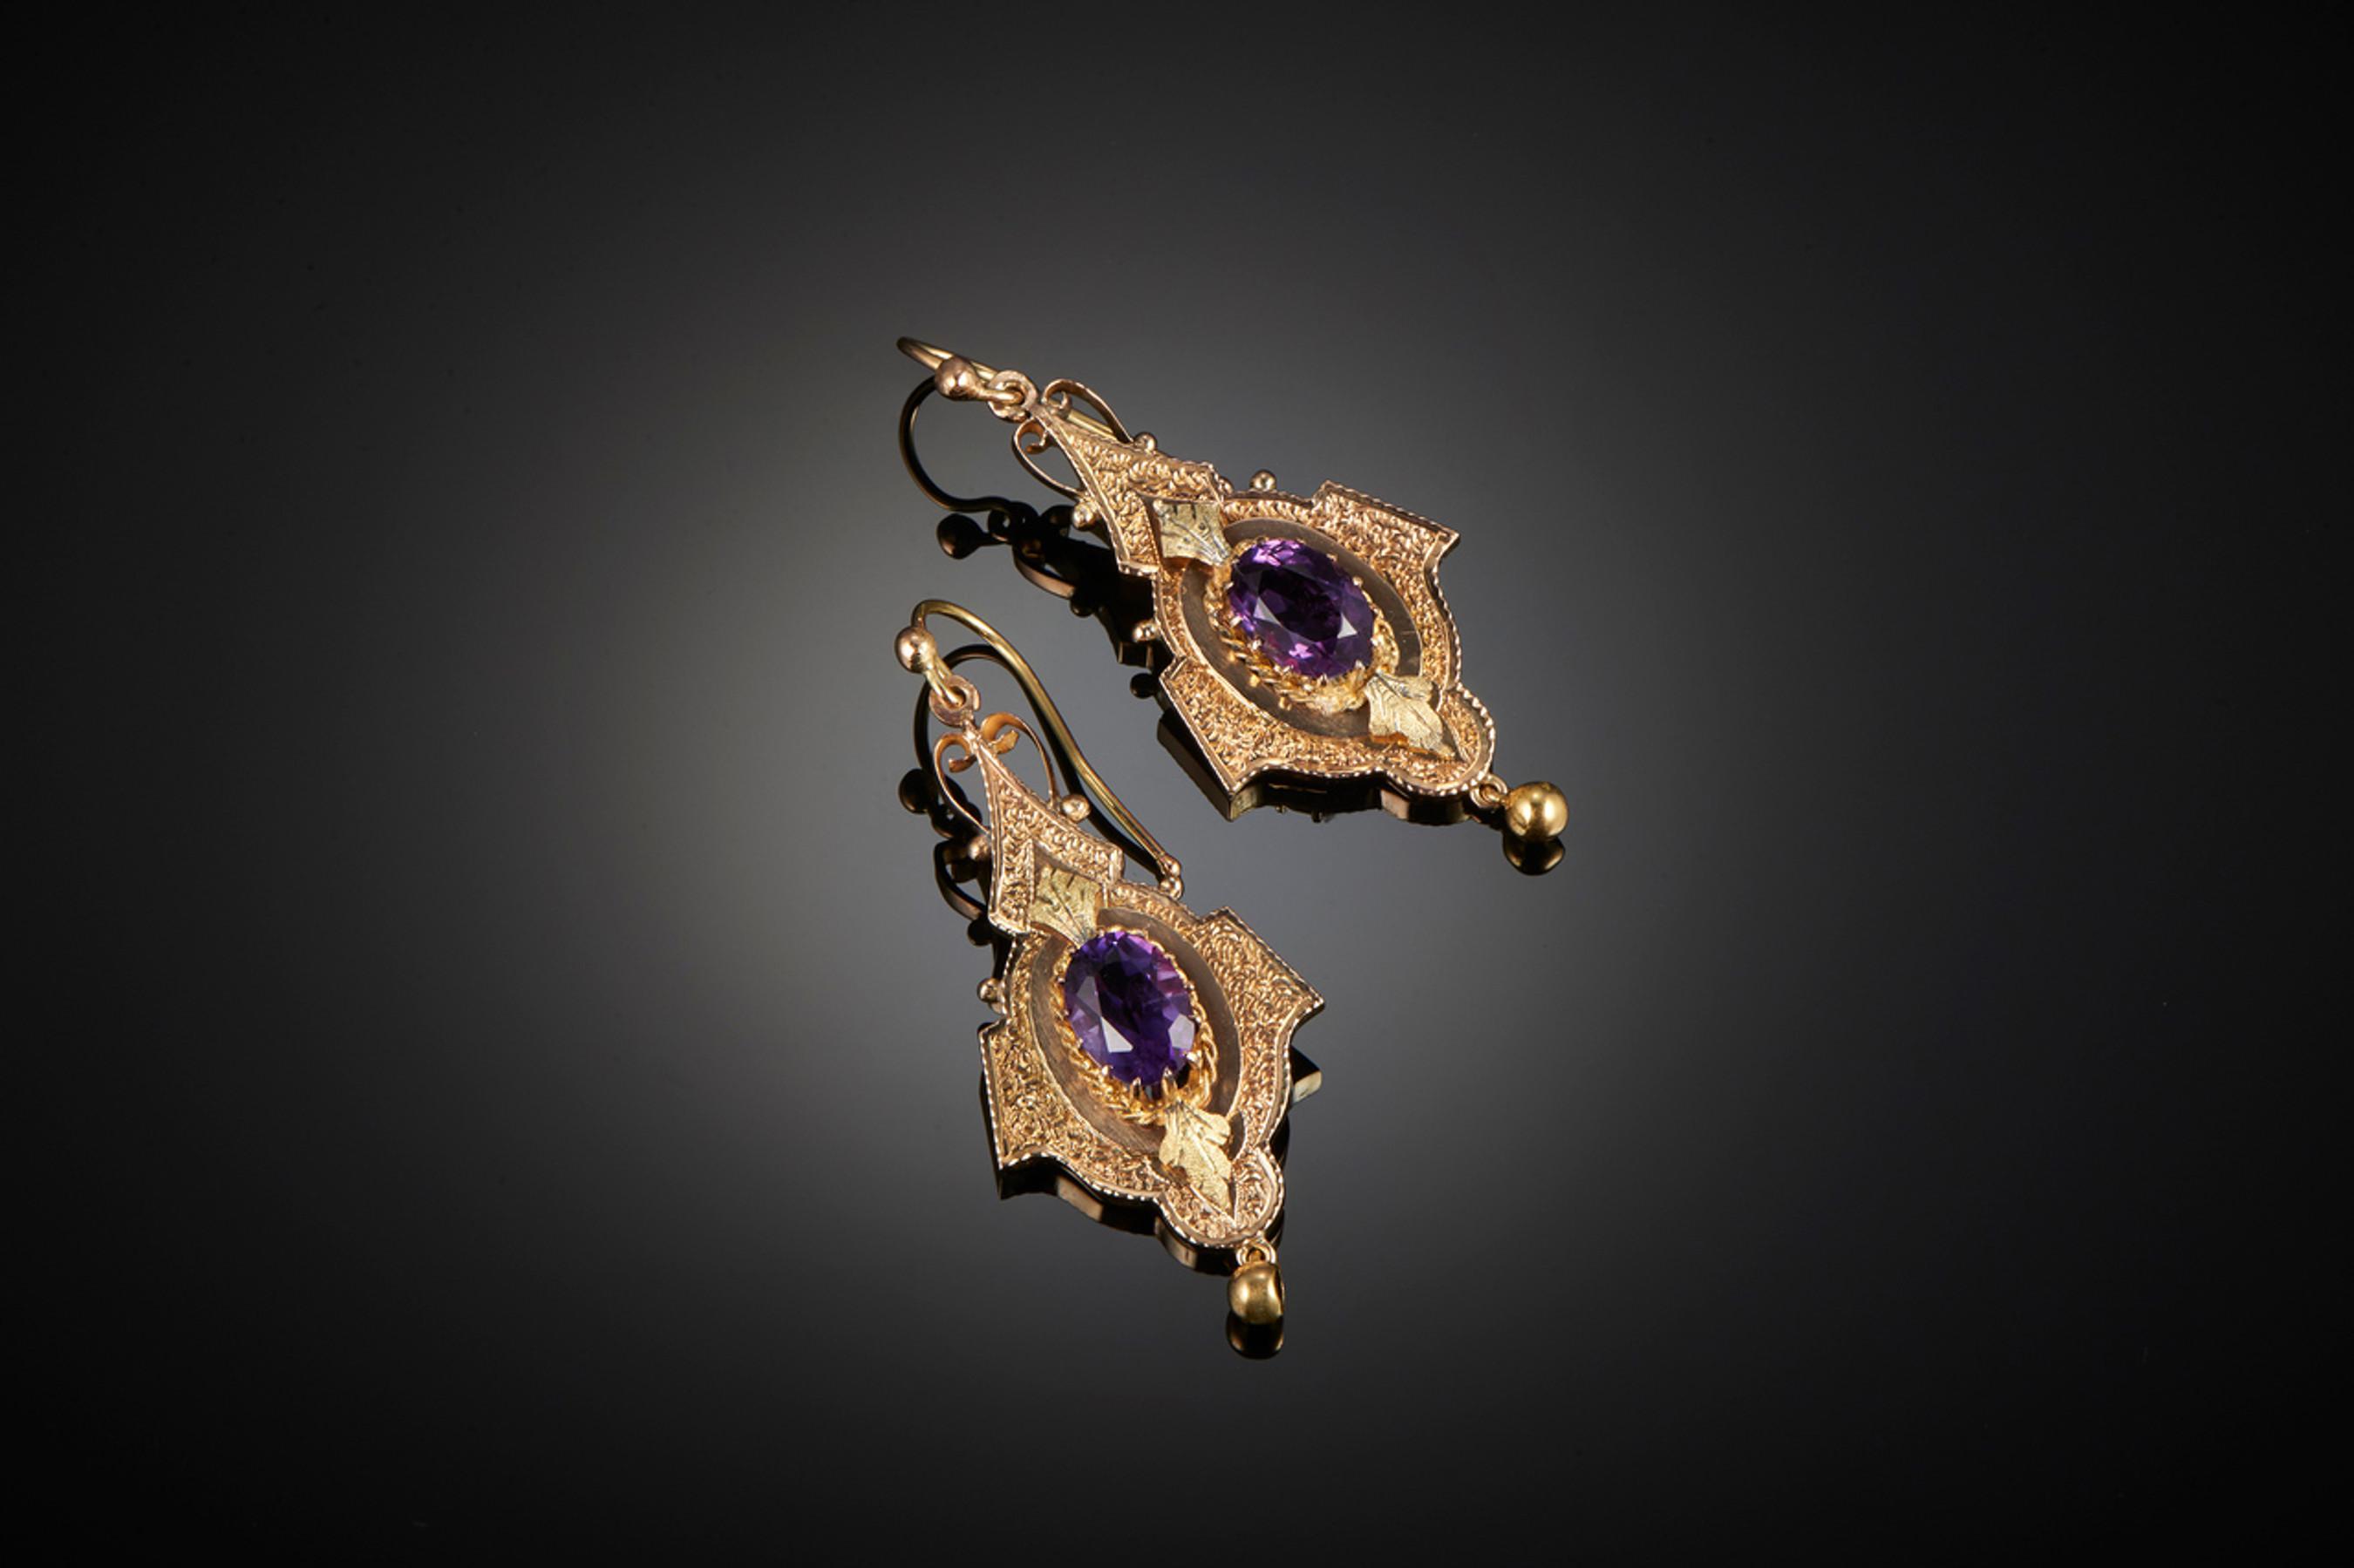 Wonderful Pair of Victorian Amethyst Pendant Earrings - Front Image